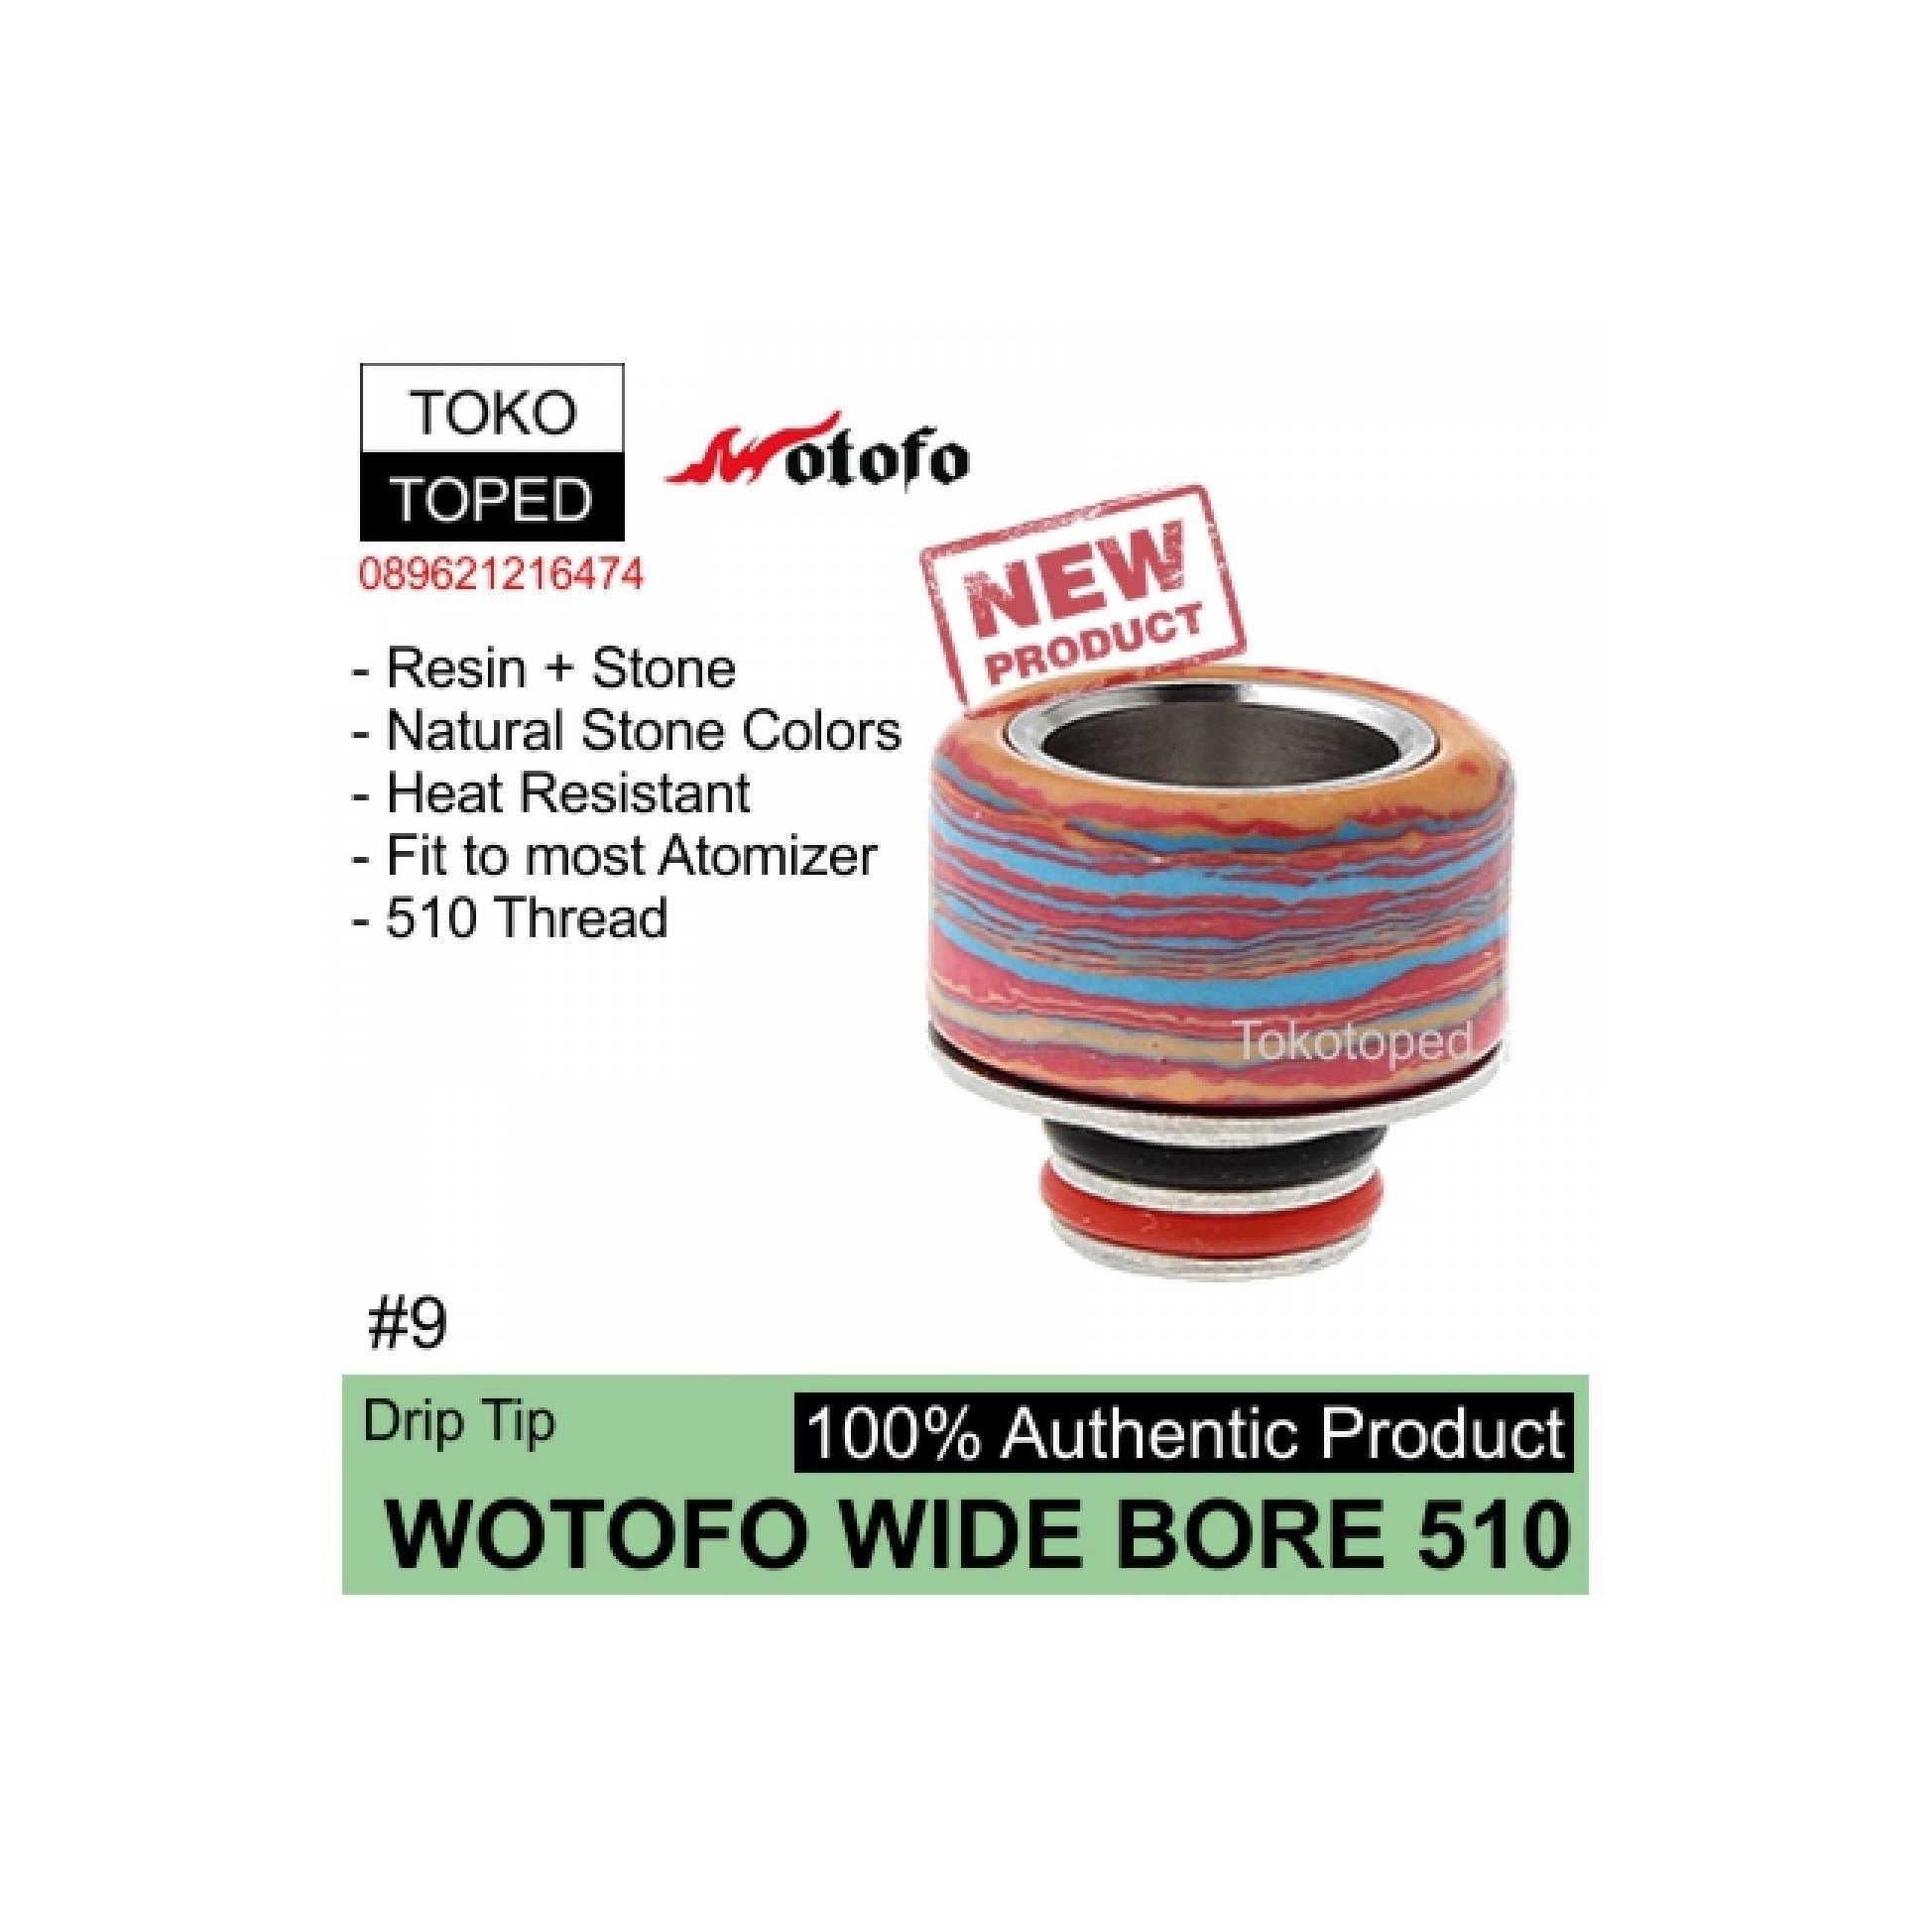 Fitur Authentic Wotofo Wide Bore 510 Drip Tip 9 Driptip Resin Geekvape Peerless 24mm Rda Atomizer Vape Rdta